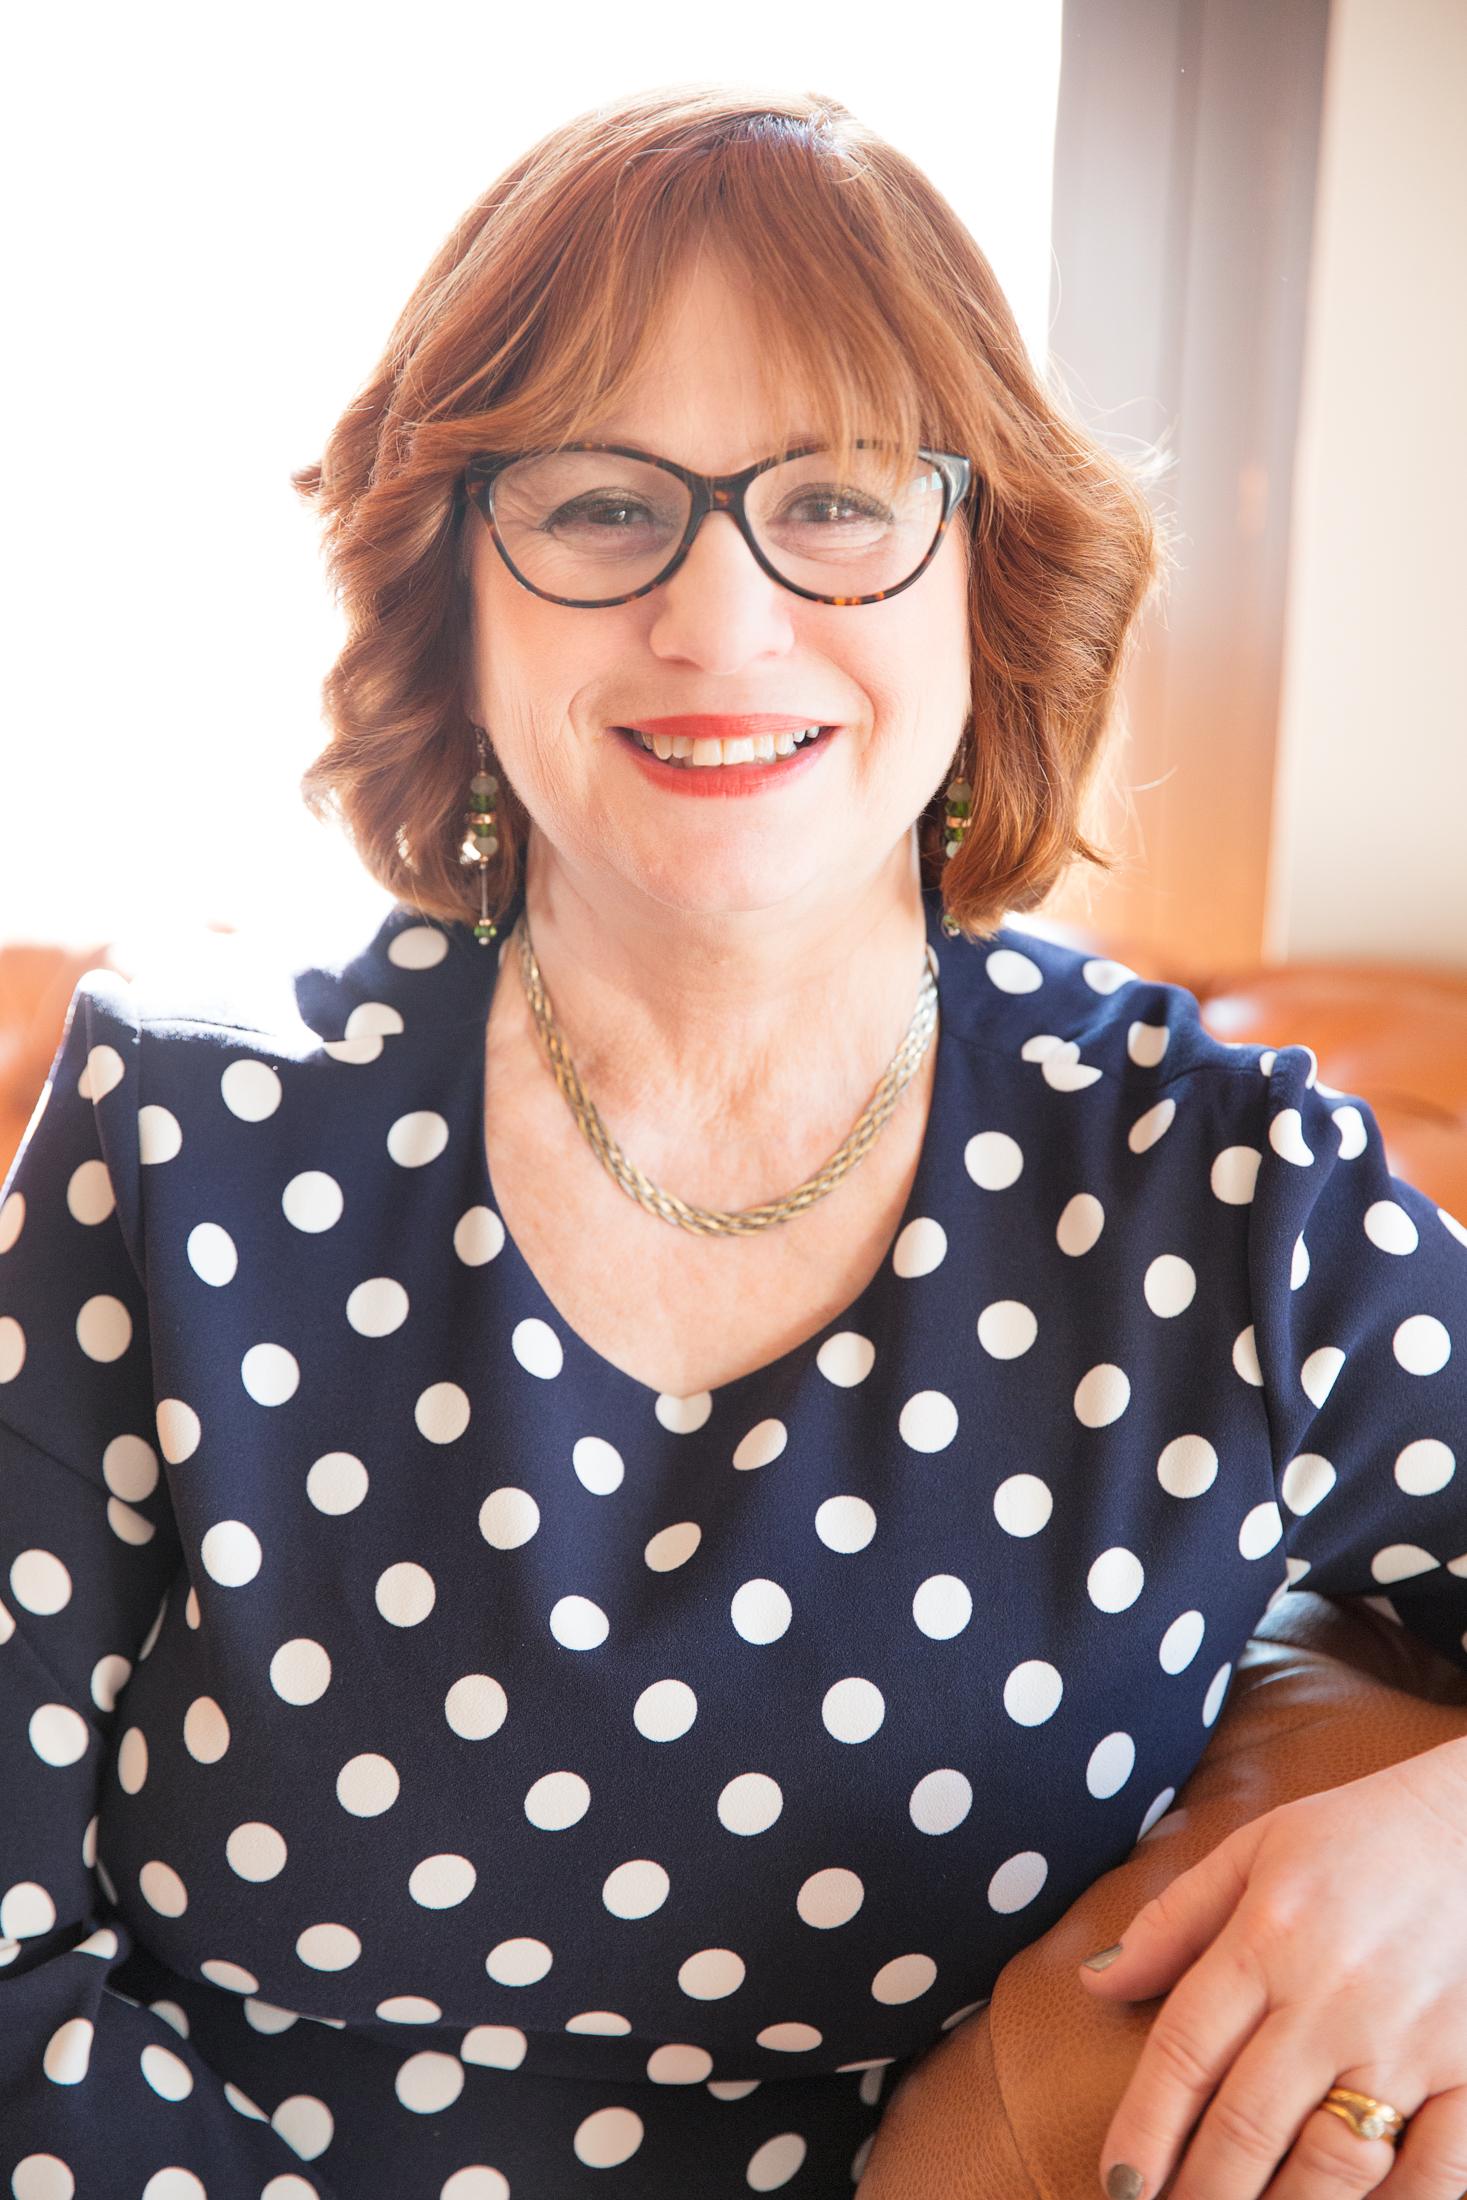 Shelley Fishel